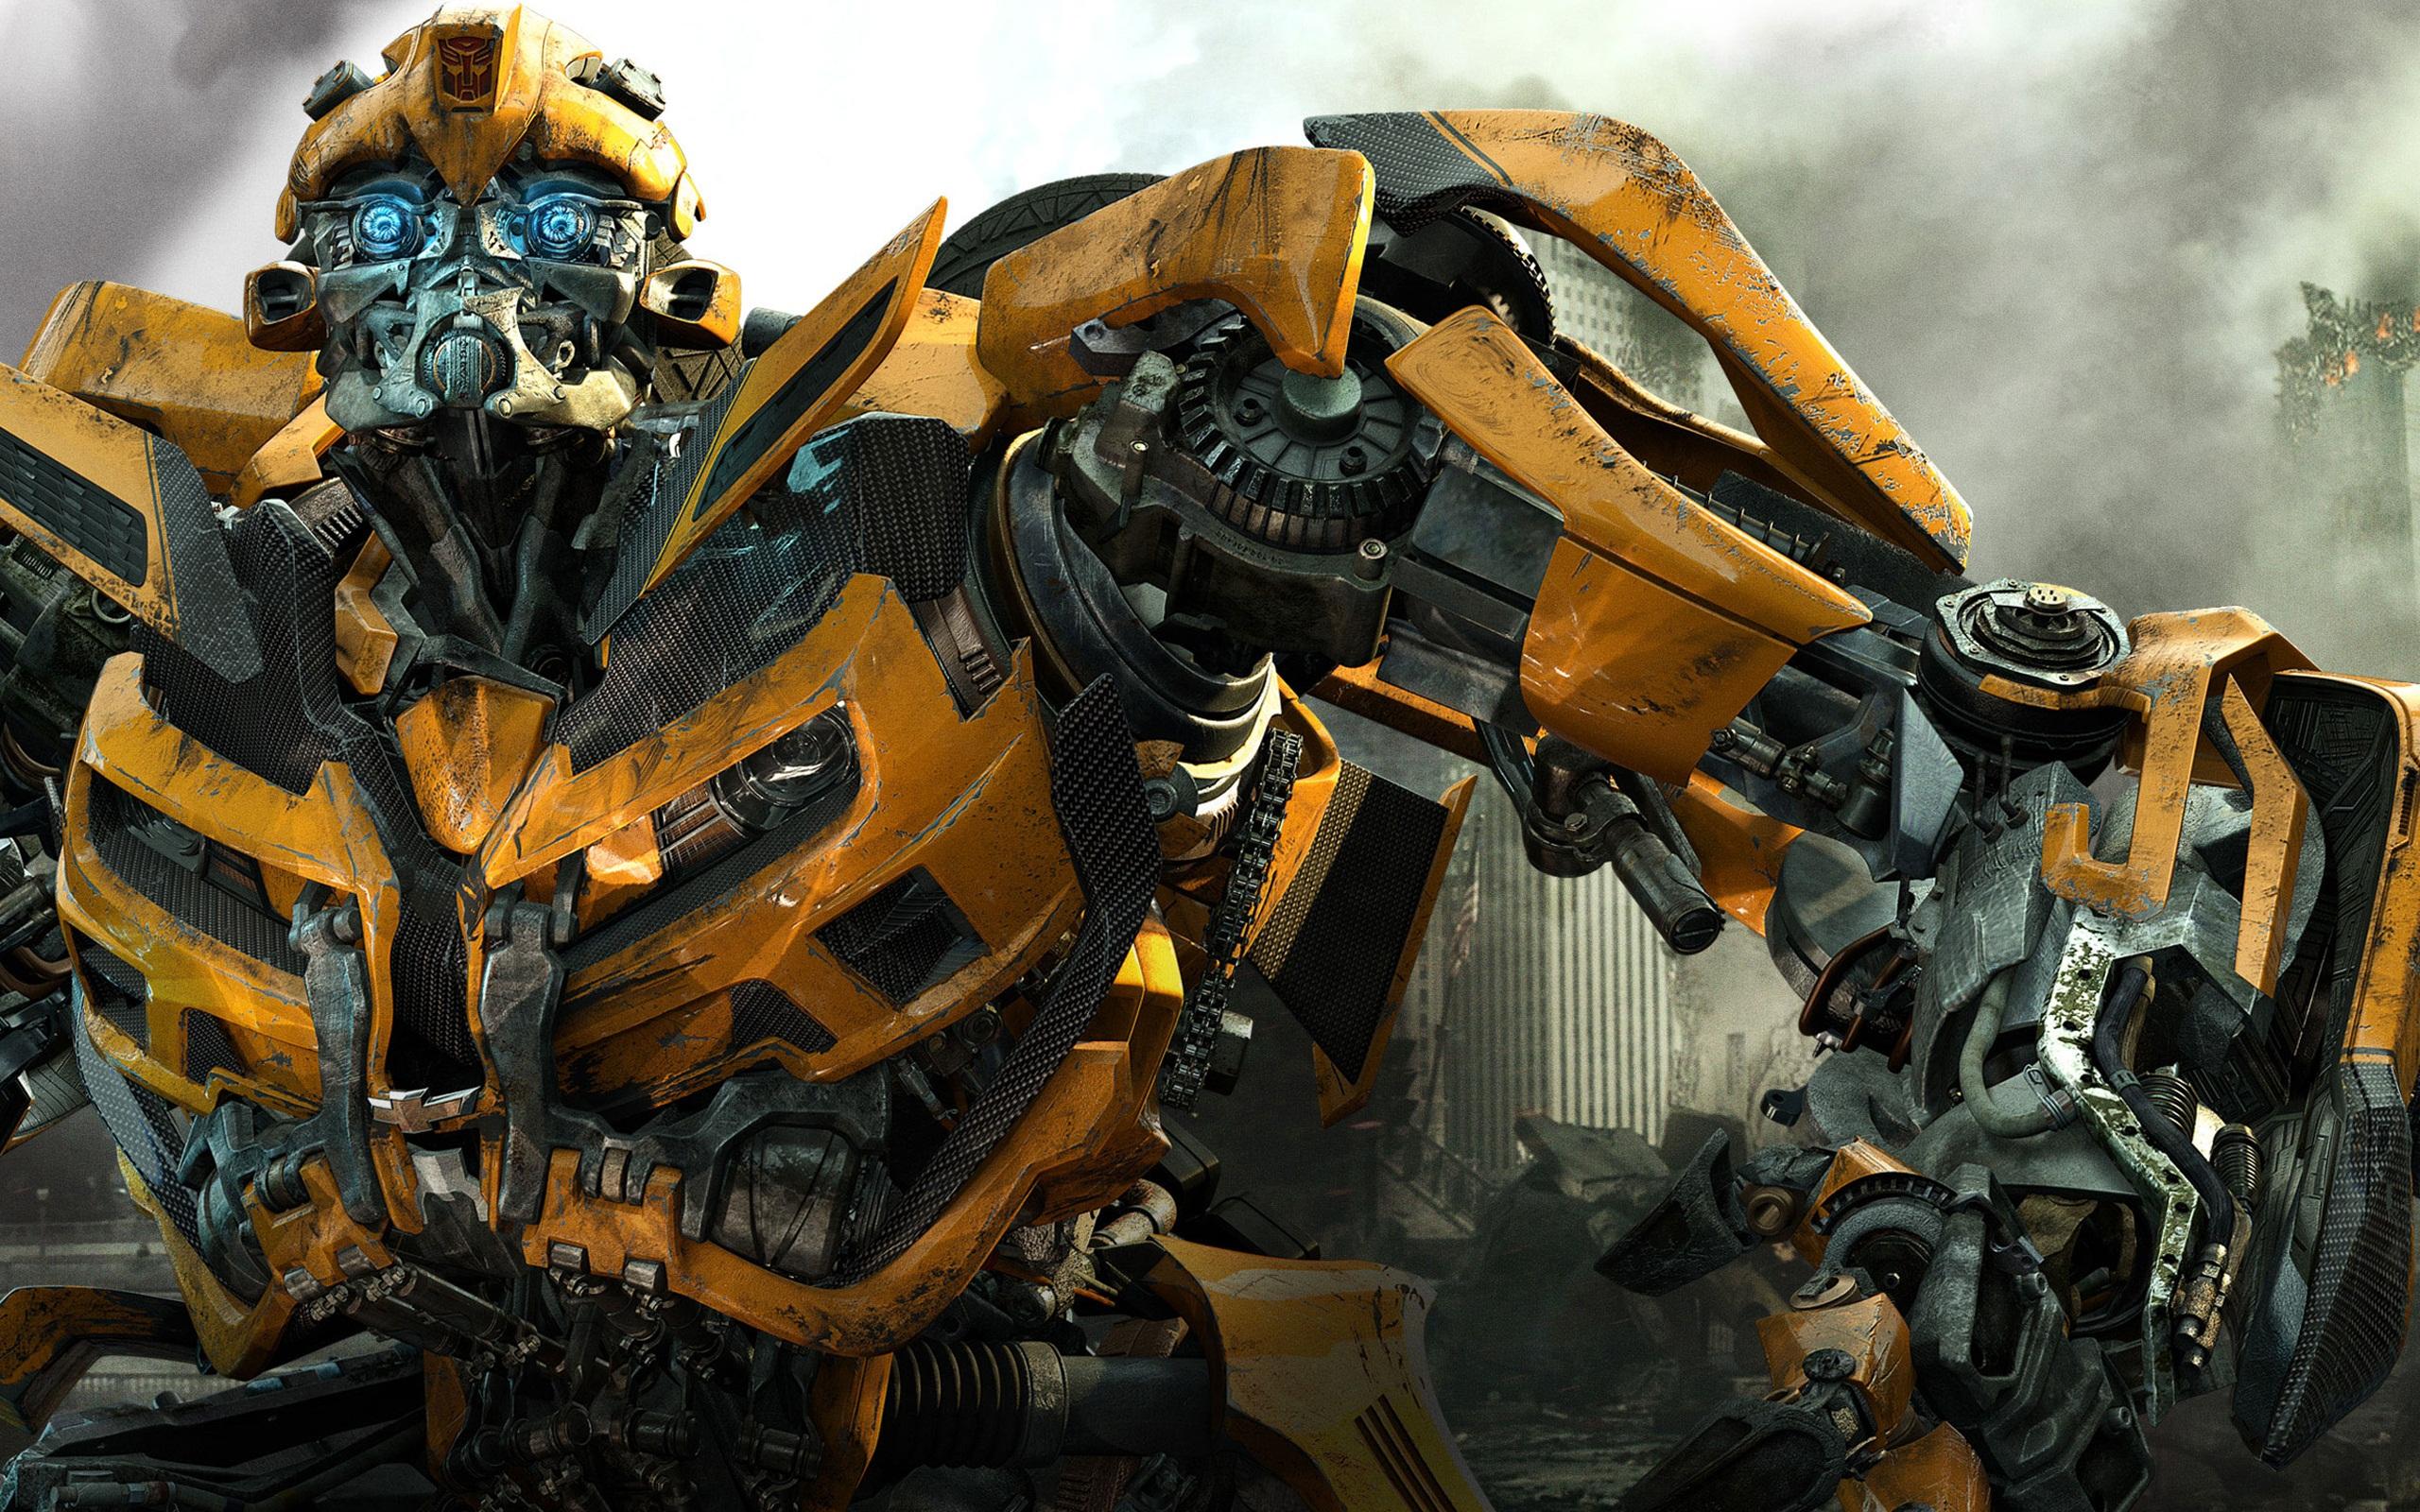 Transformers Wallpaper 5218 2560x1600 Px HDWallSource